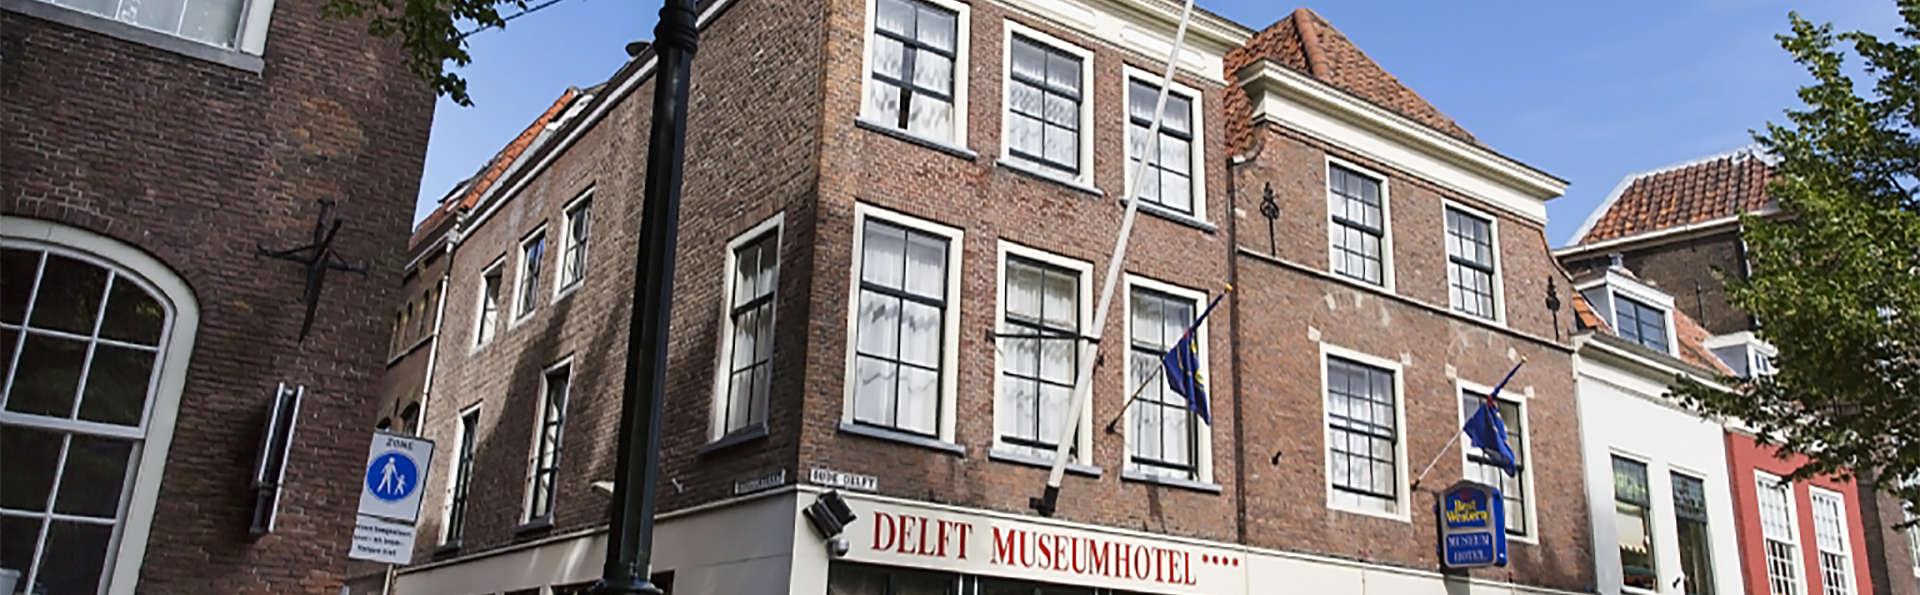 Best Western Museumhotels Delft - EDIT_front.jpg